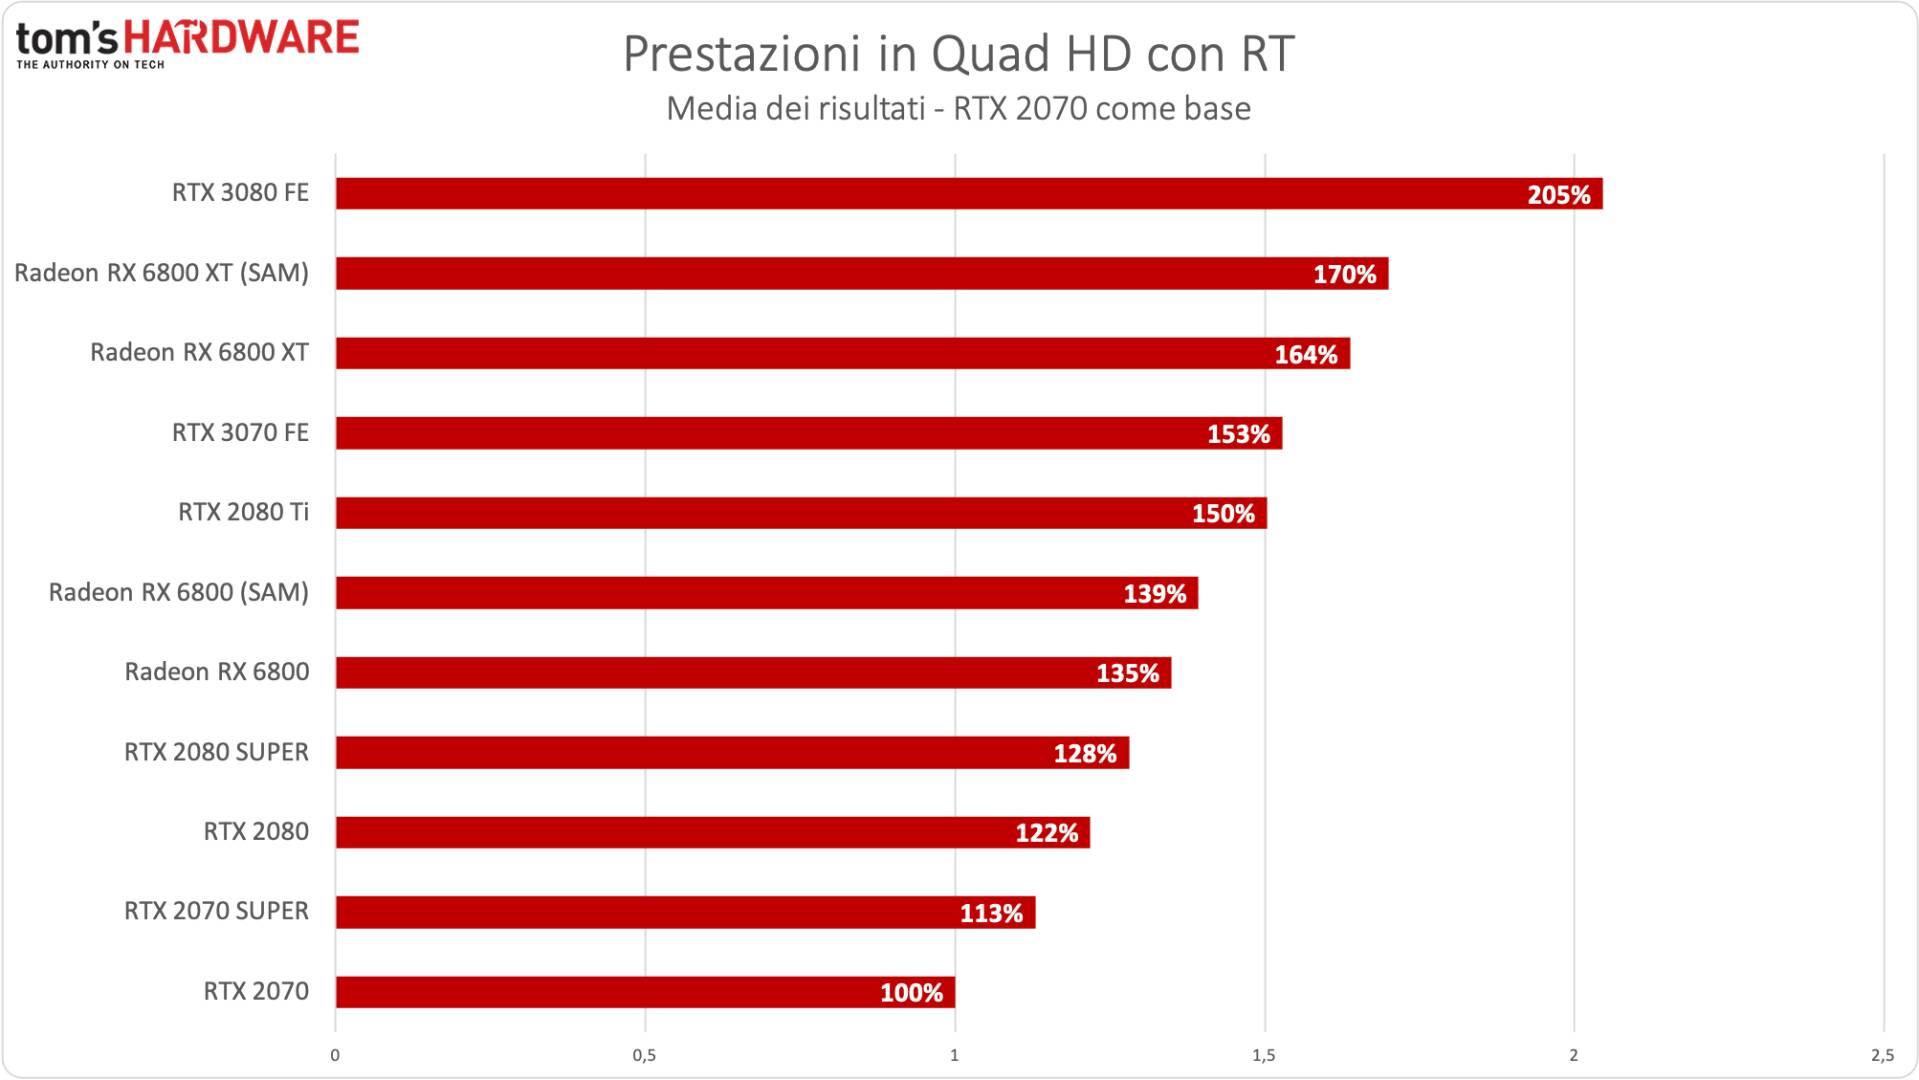 Benchmark Radeon RX 6800 XT / RX 6800 - QHD RTX - Incremento % RTX 2070